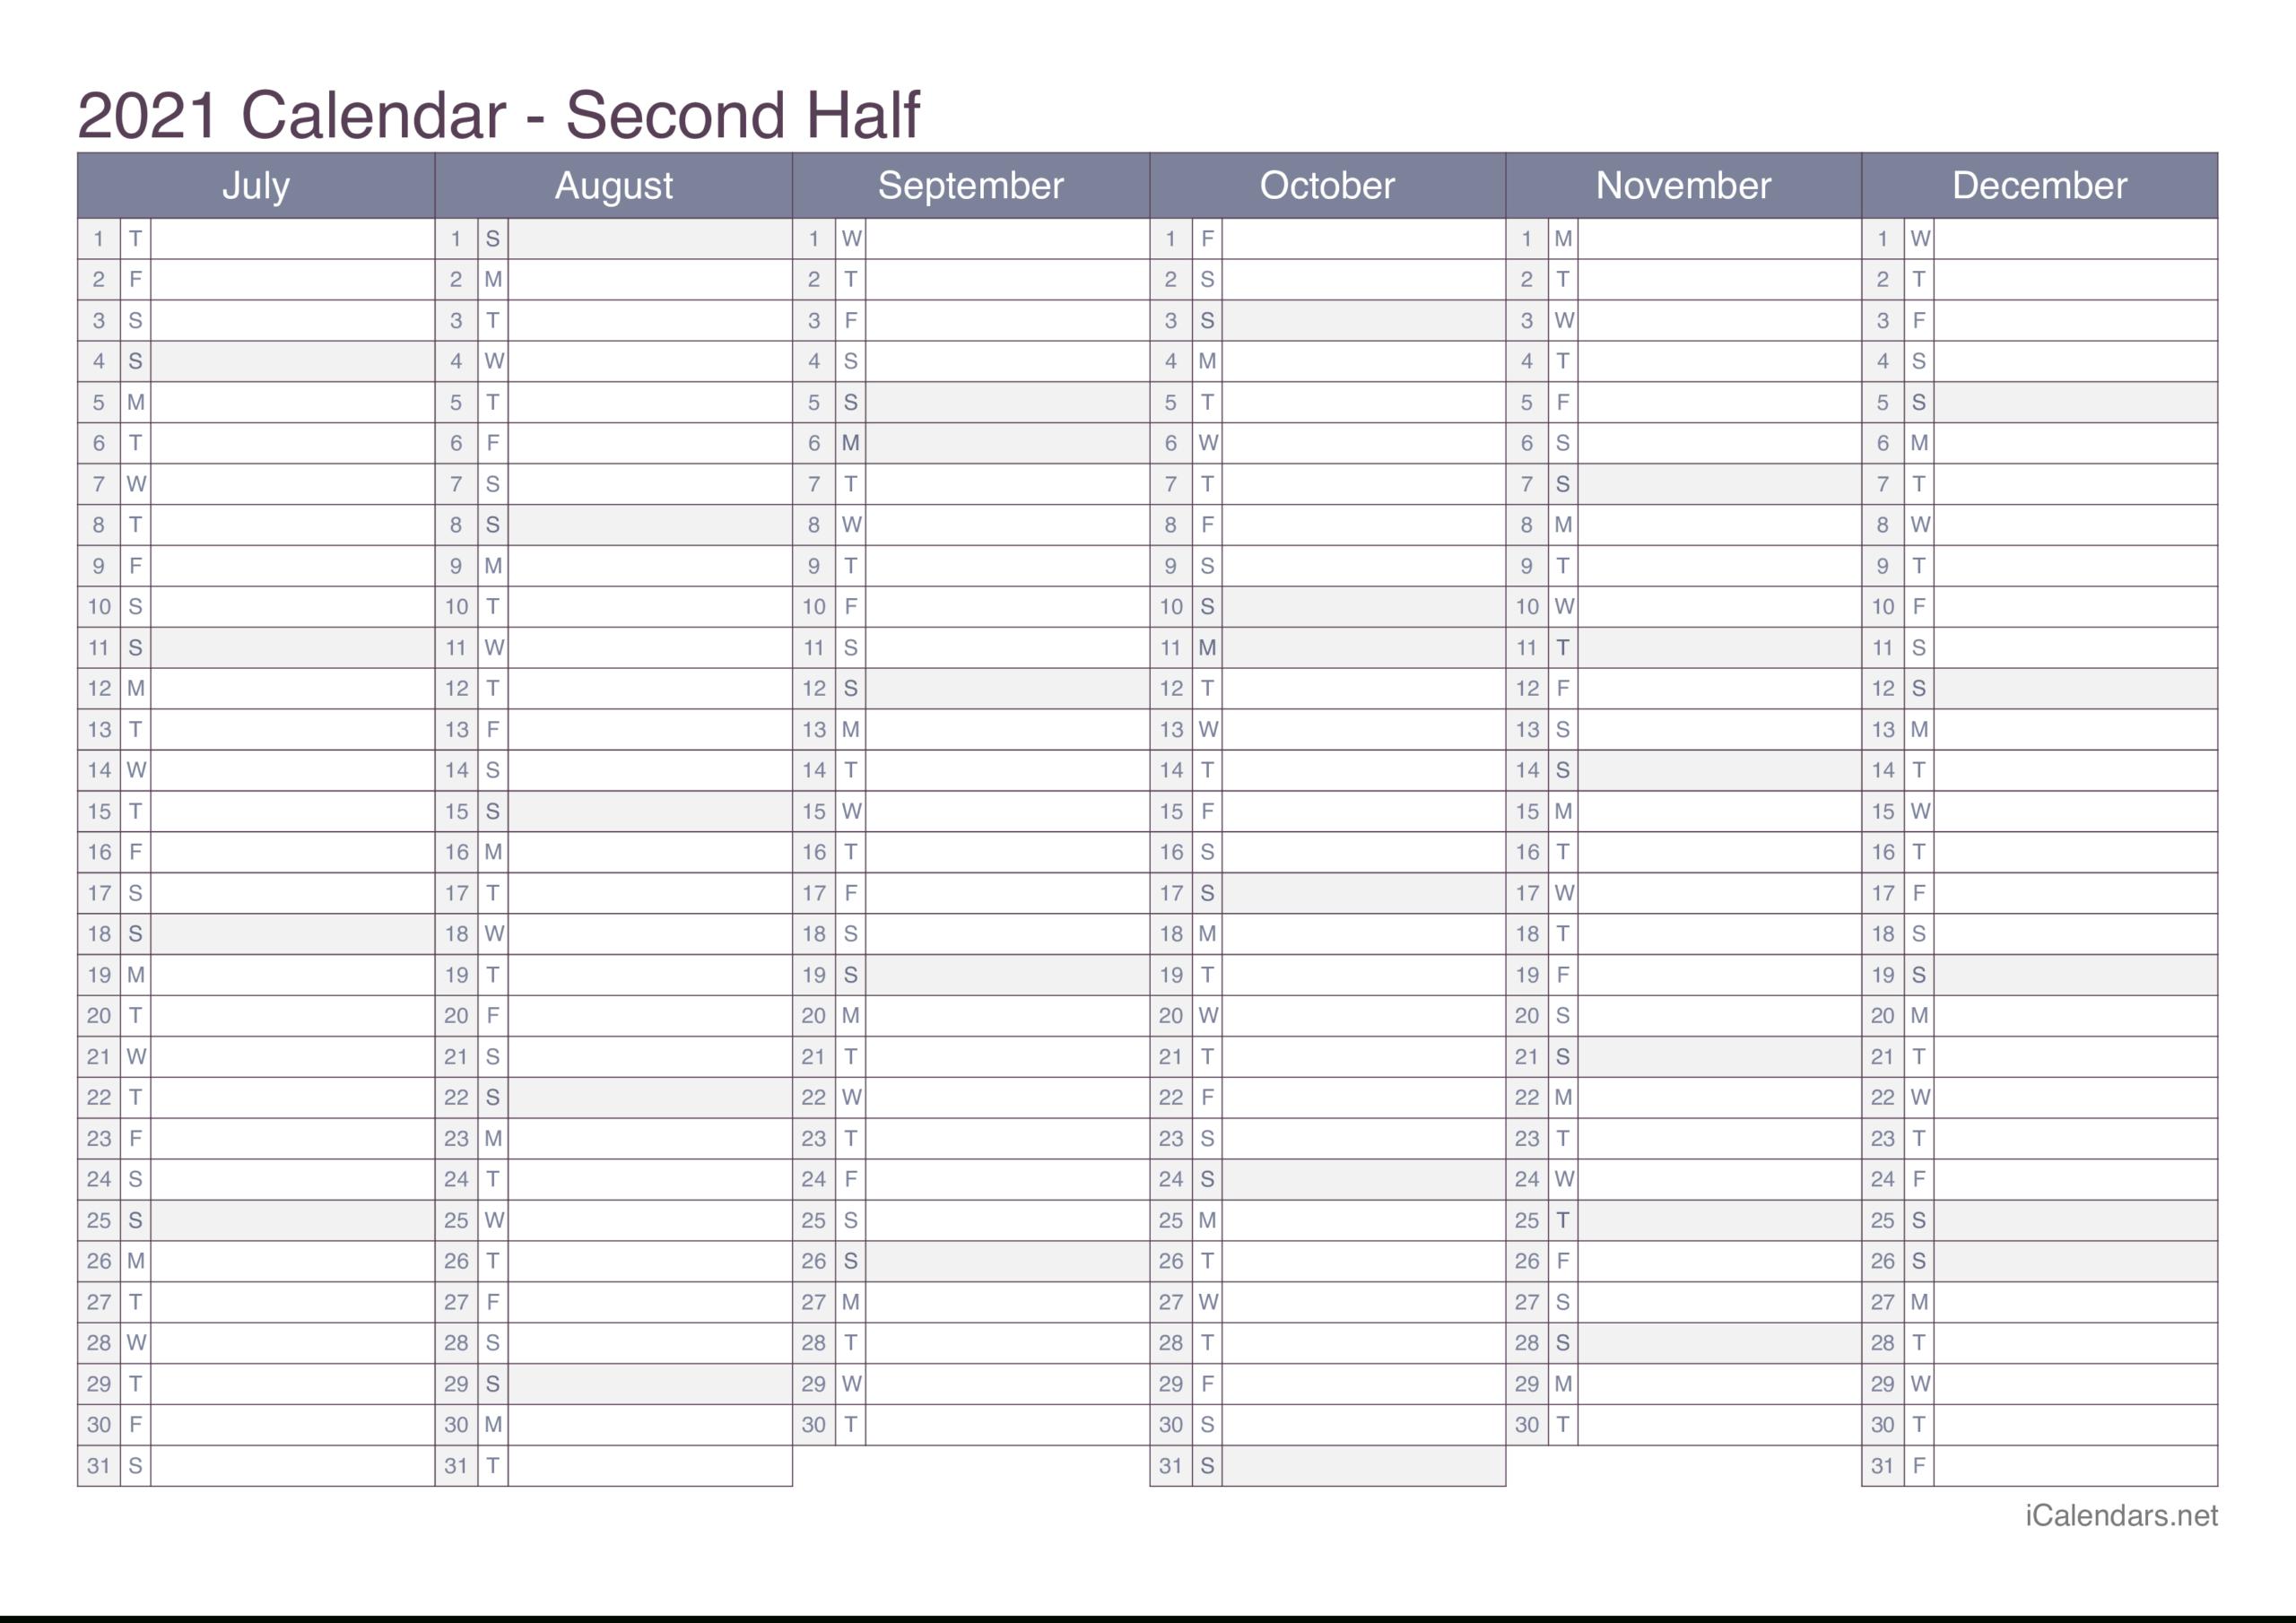 2021 Printable Calendar - Pdf Or Excel - Icalendars for Fill In Calendar 2021 Printable